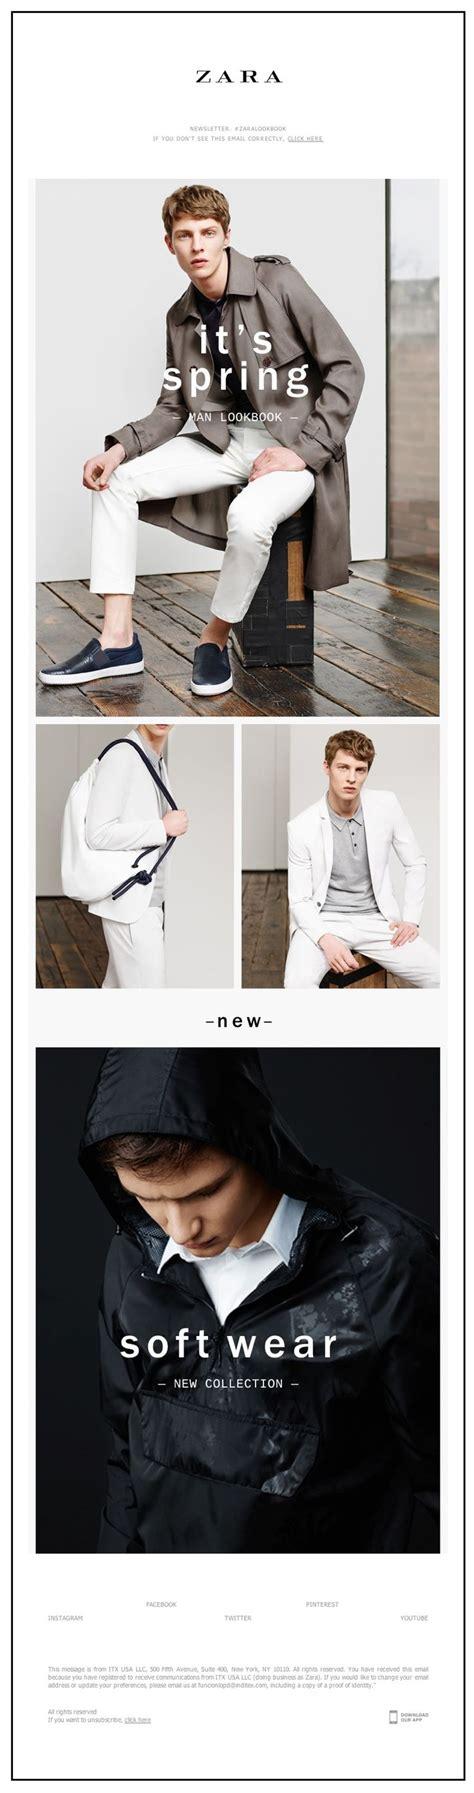 zara newsletter photo email design www datemailman fashion newsletters 17 best ideas about zara store on zara trousers topshop and zara